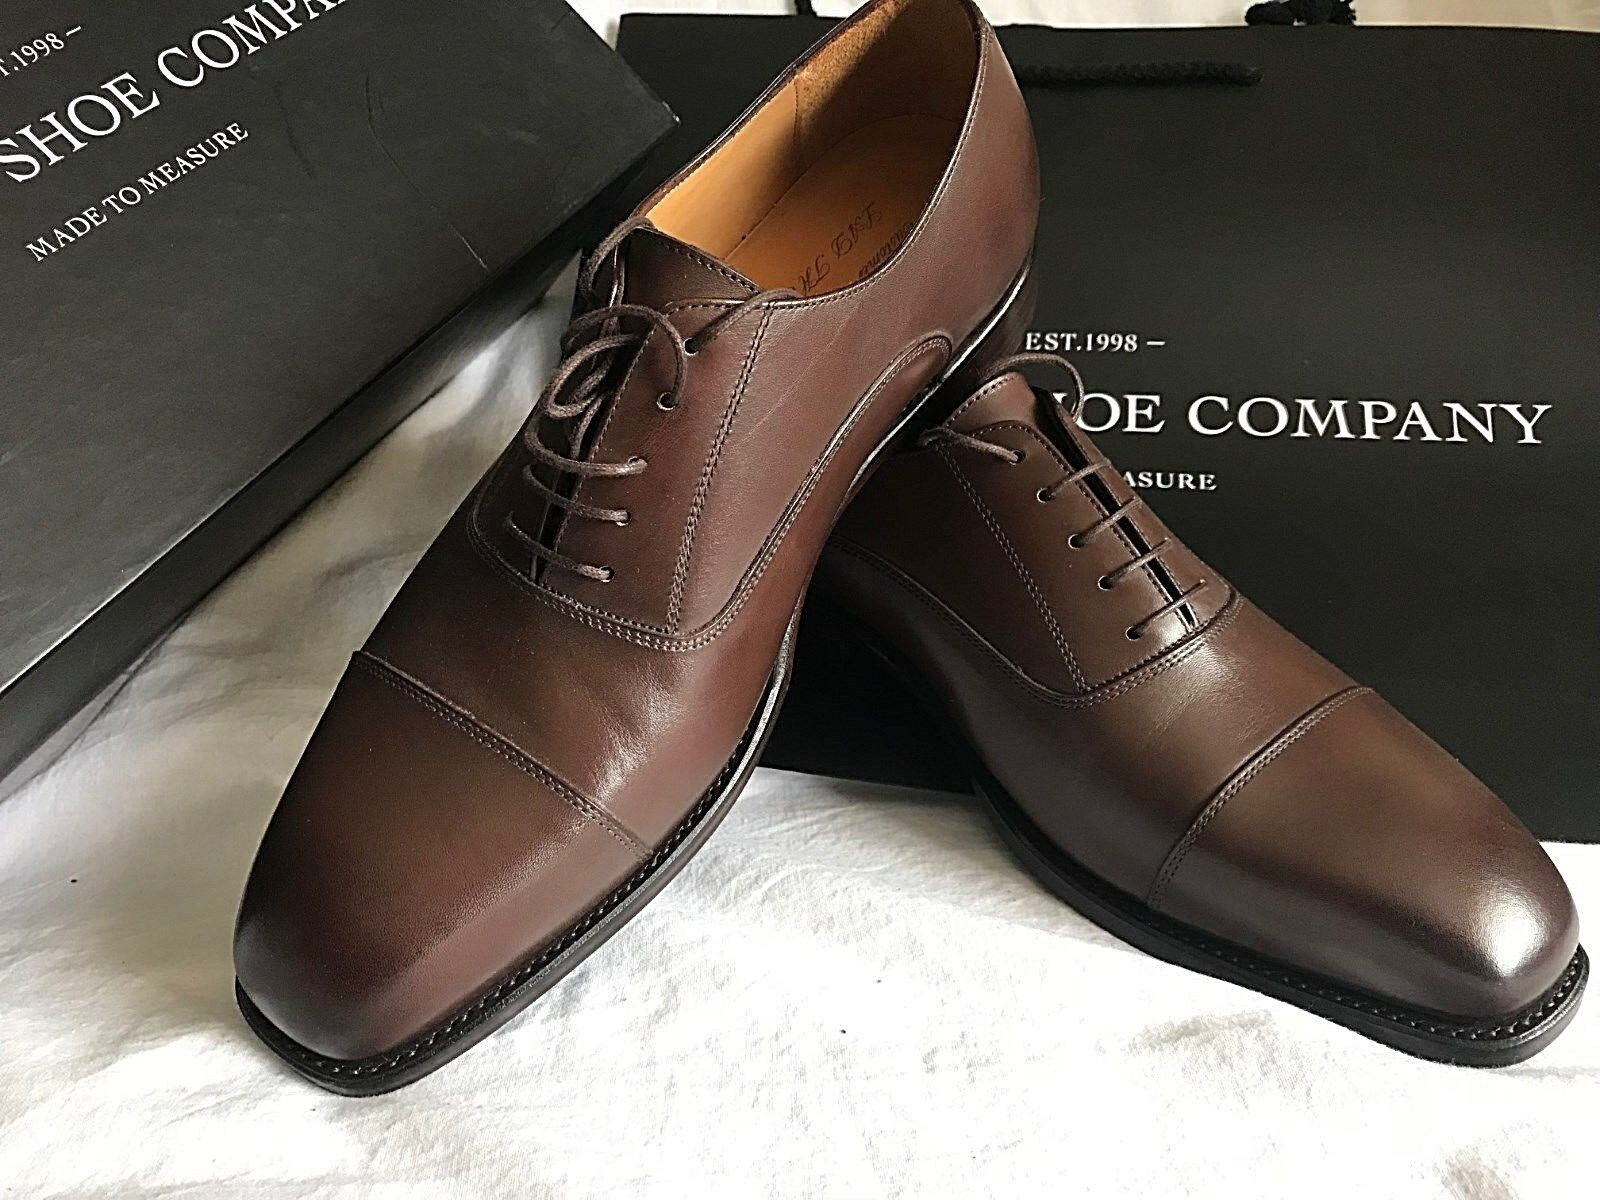 La chaussure gauche Company custom made Balmoral Oxford Brown Oxford Balmoral Formelles Chaussures 0e0df7